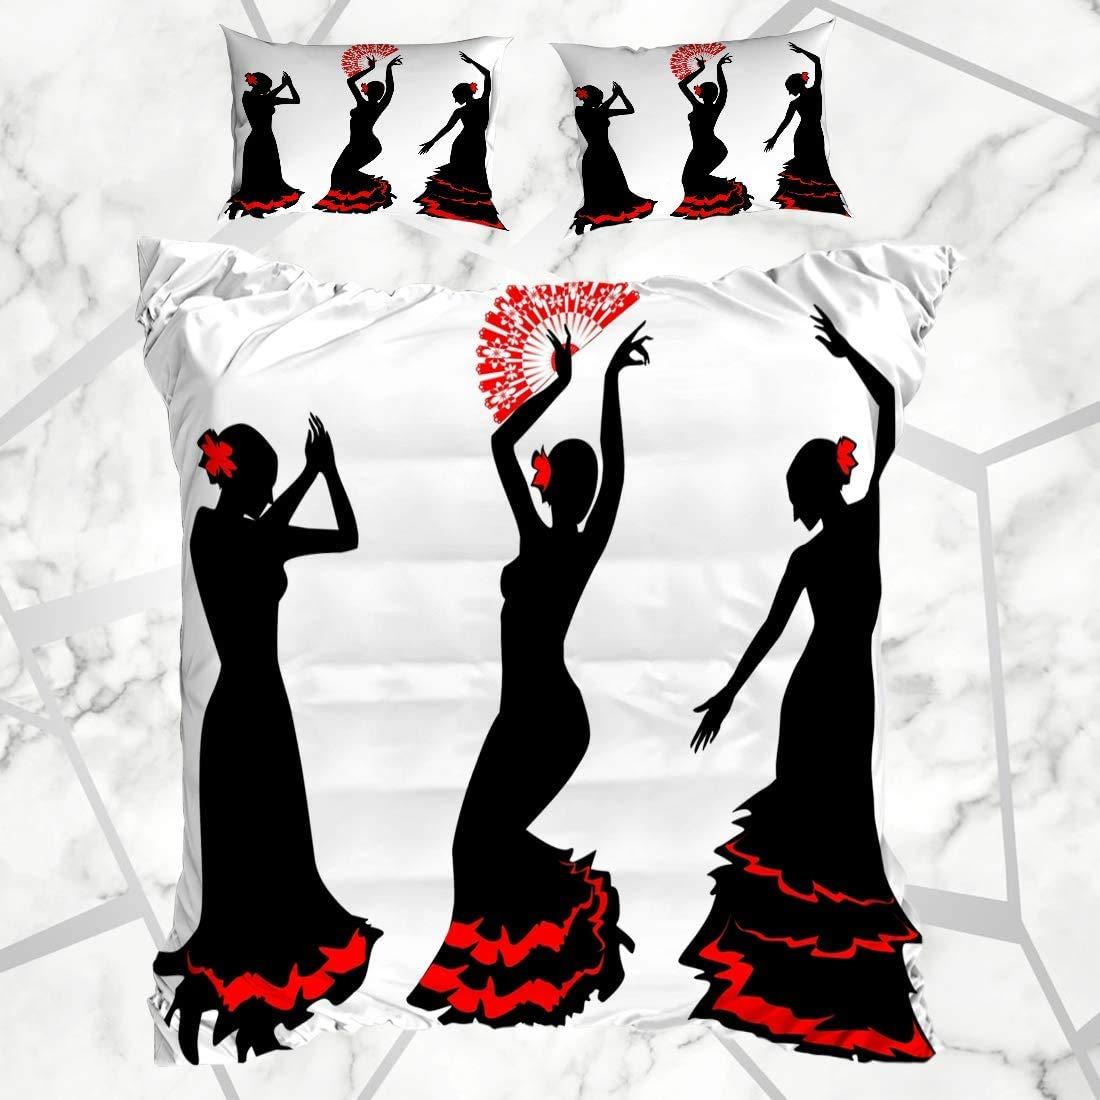 Conjuntos de funda nórdica Grace Silhouette con tres siluetas Bailaora de flamenco Gitana Ritmo Fan España Rumba Personas Tango Suave Microfibra Dormitorio decorativo con 2 fundas de almohada: Amazon.es: Hogar